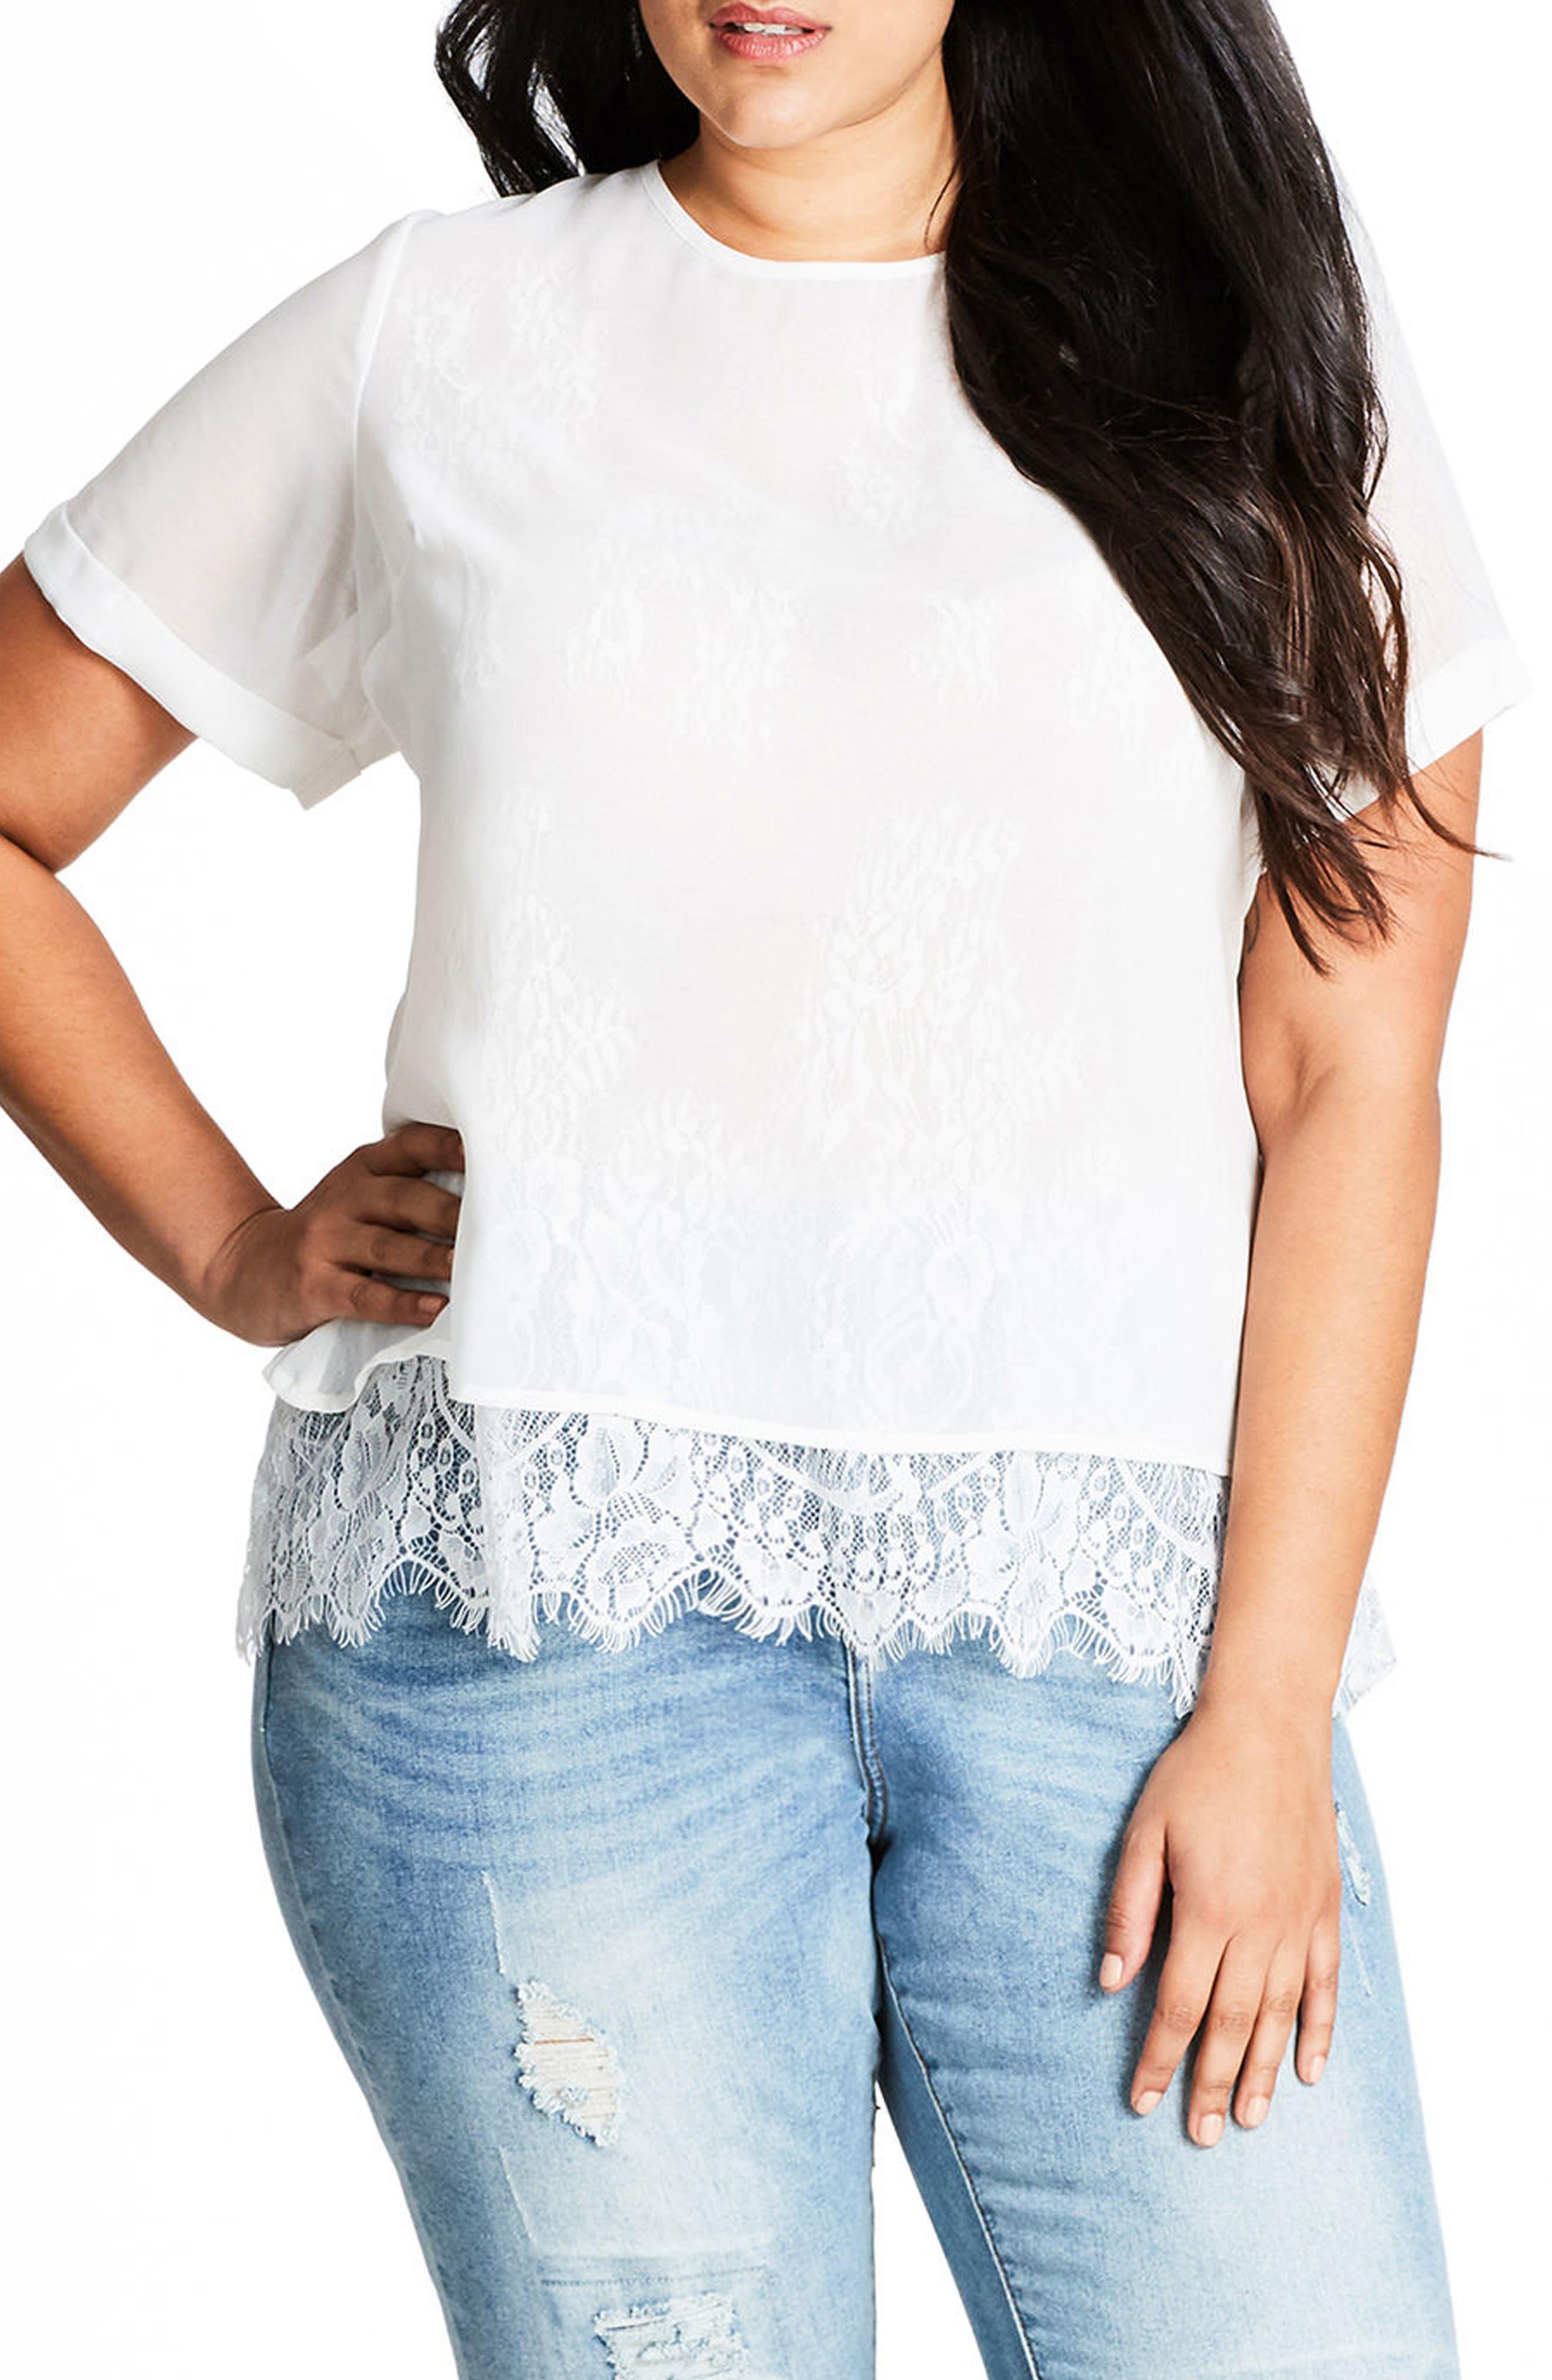 Main Image - City Chic Lace Scallop Top (Plus Size)